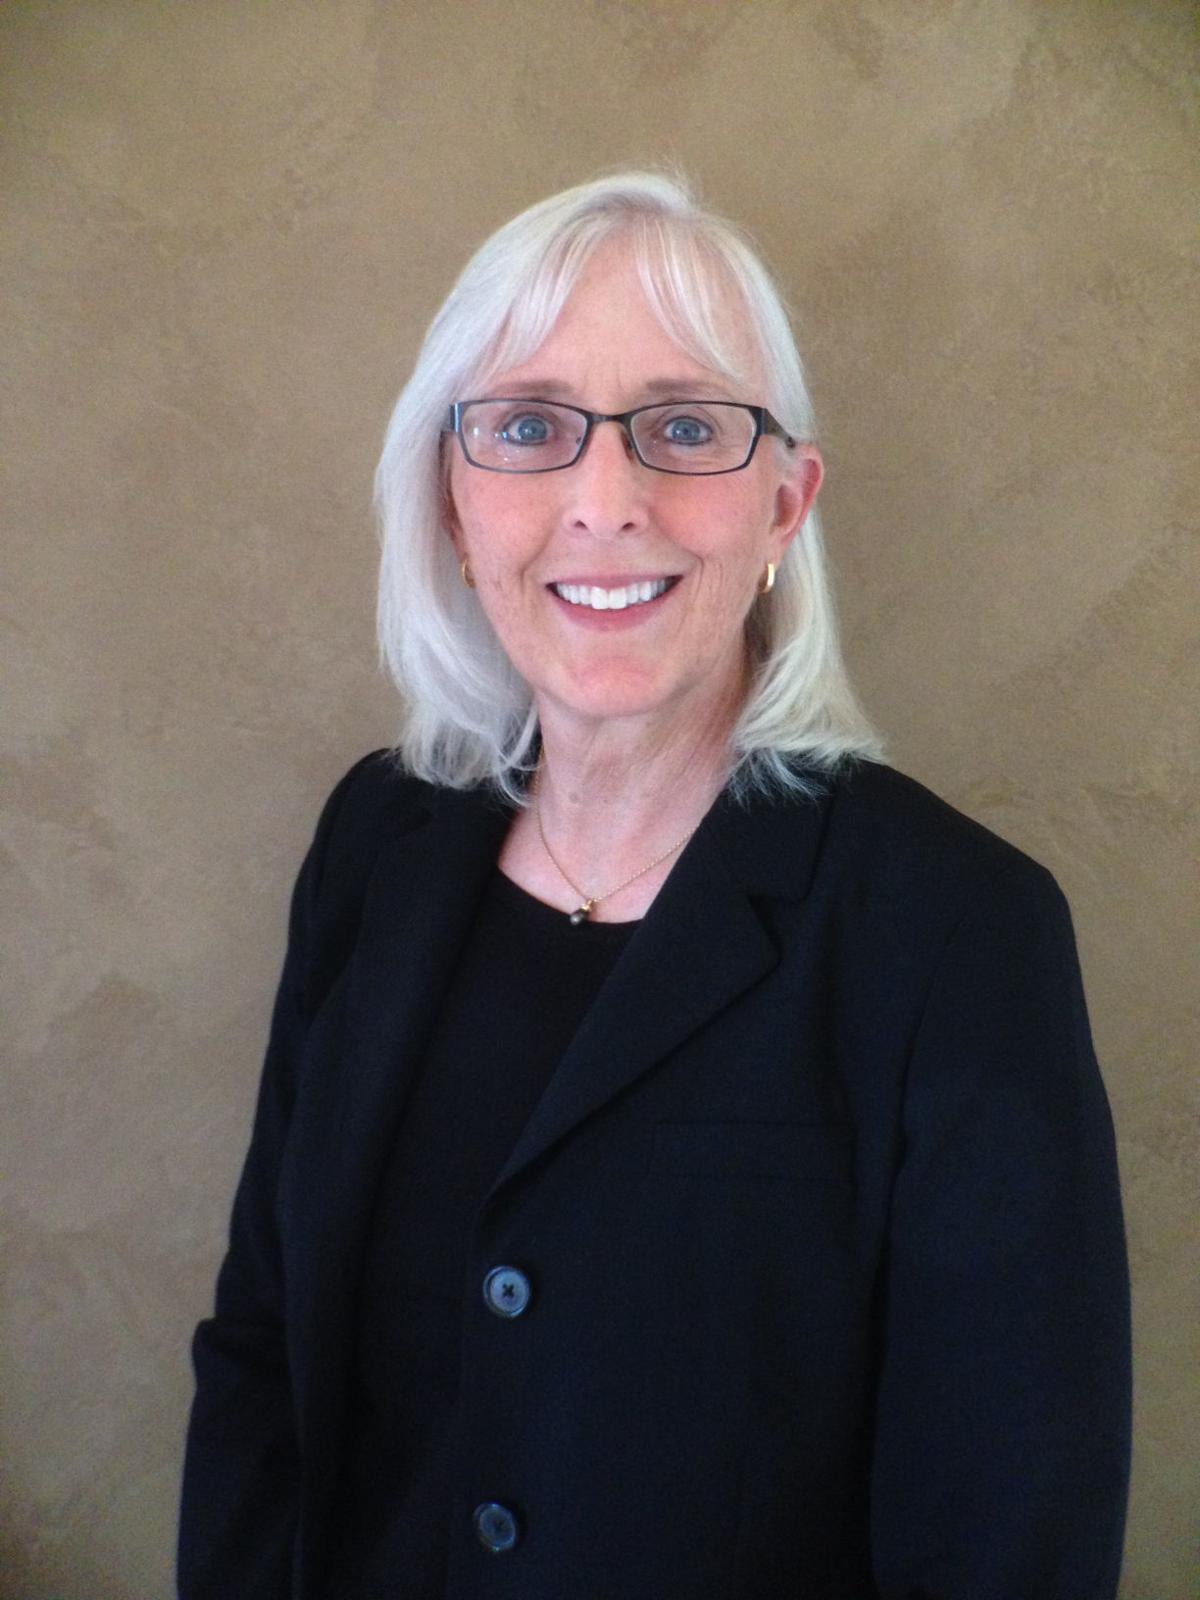 Lori J. Lefferts